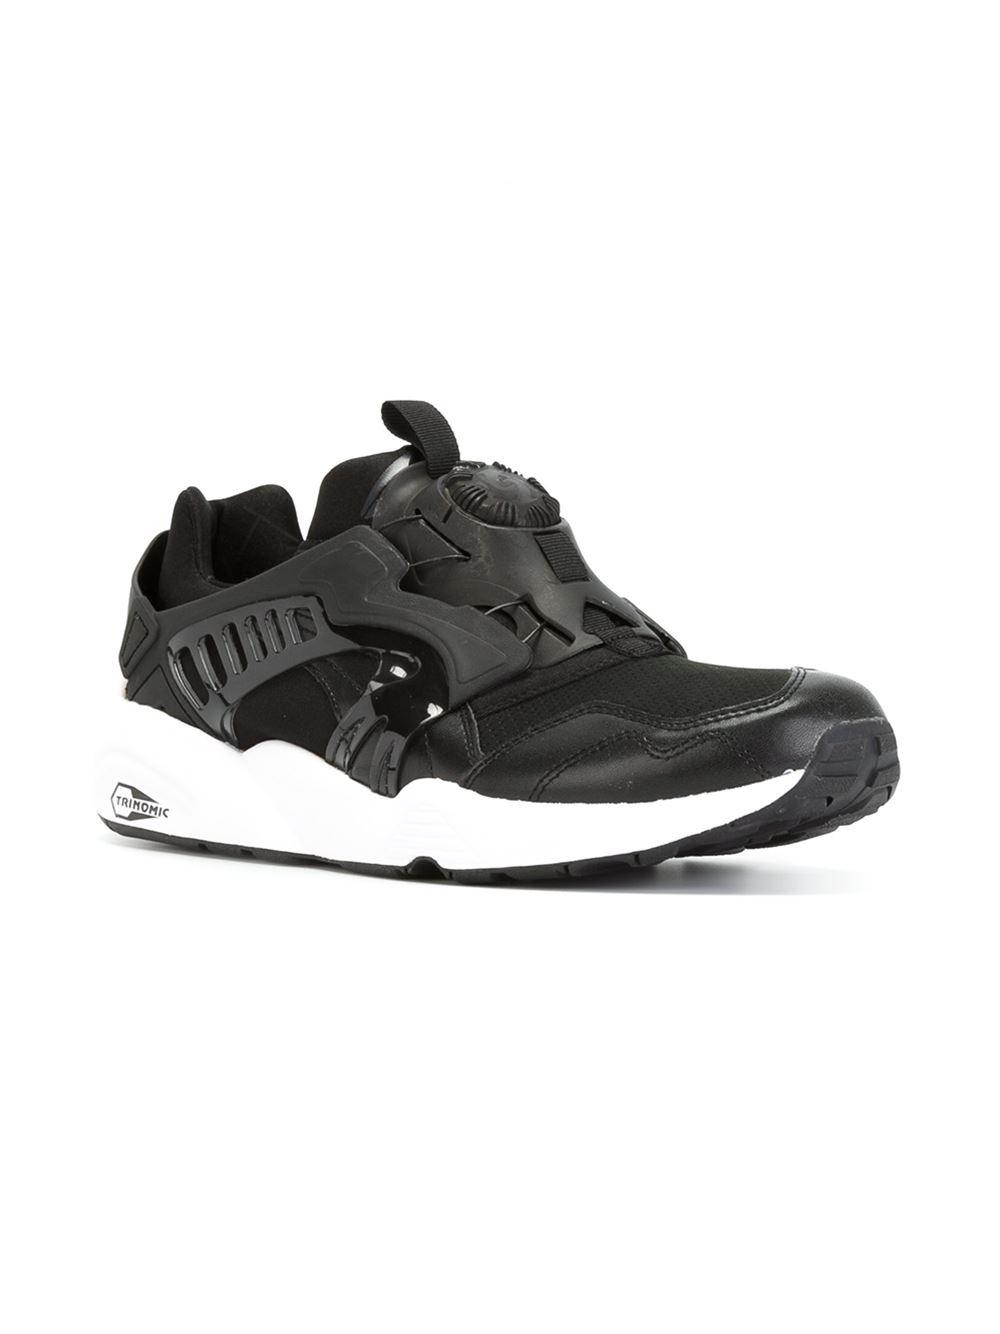 puma 39 modern trinomic disc blaze 39 sneakers in black for. Black Bedroom Furniture Sets. Home Design Ideas